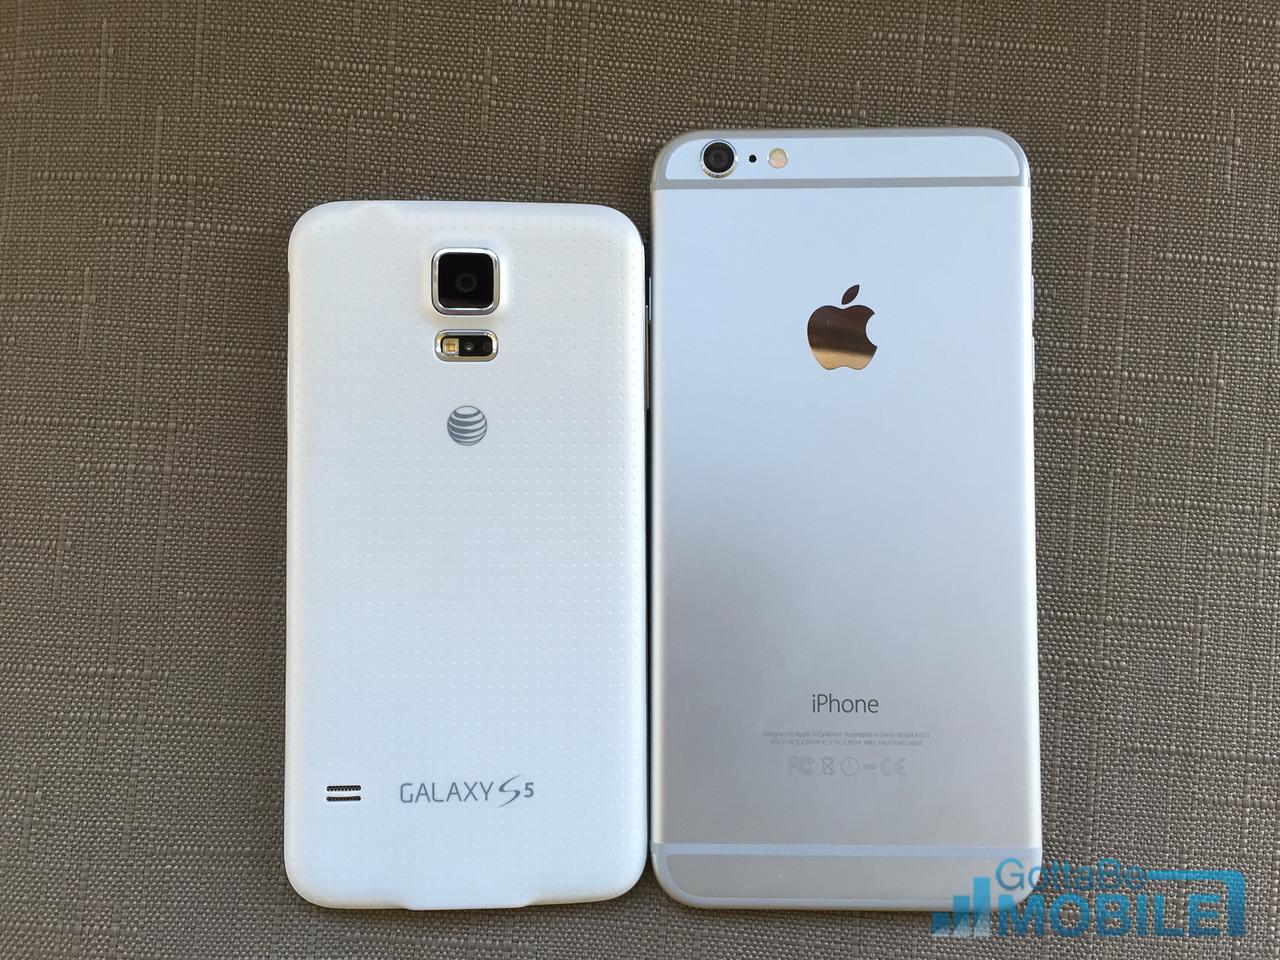 samsung galaxy s5 iphone 6